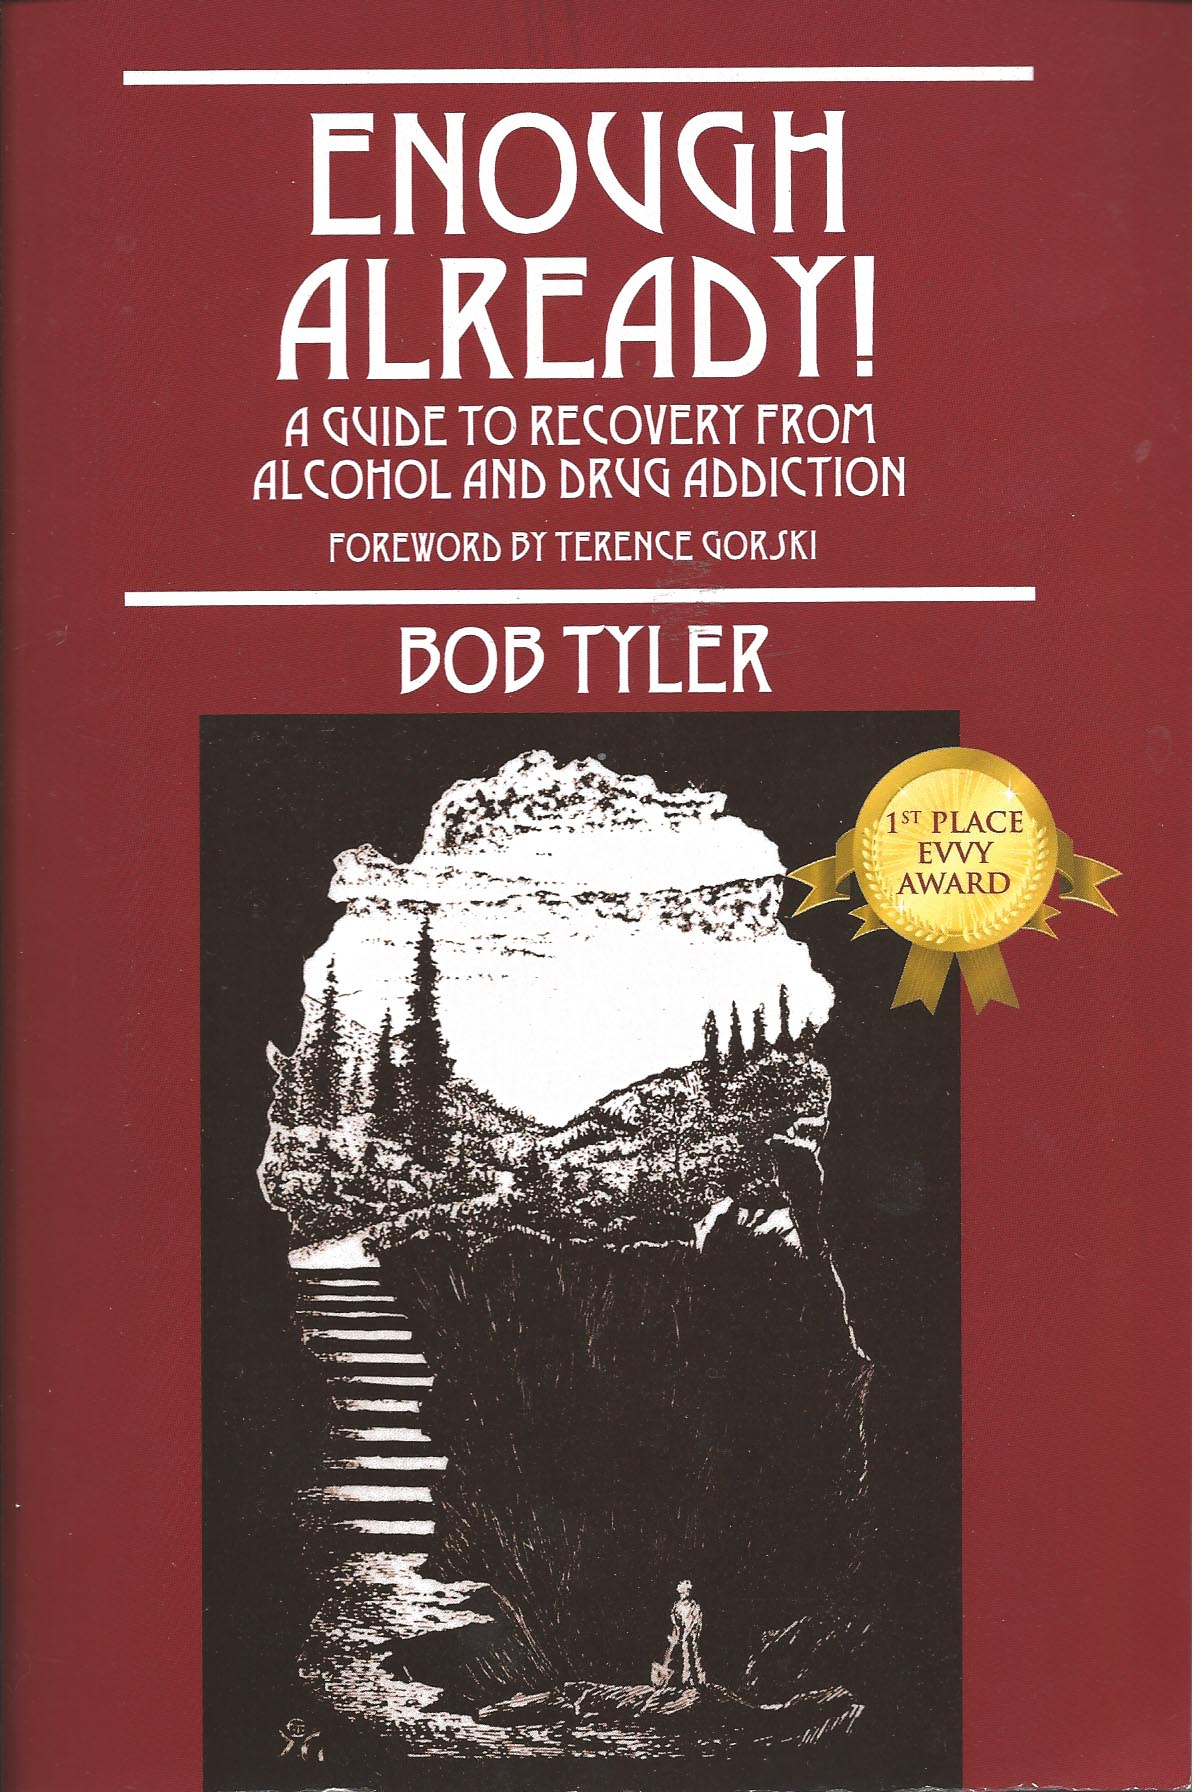 Enough Already Book Bob Tyler My 12 Step Store